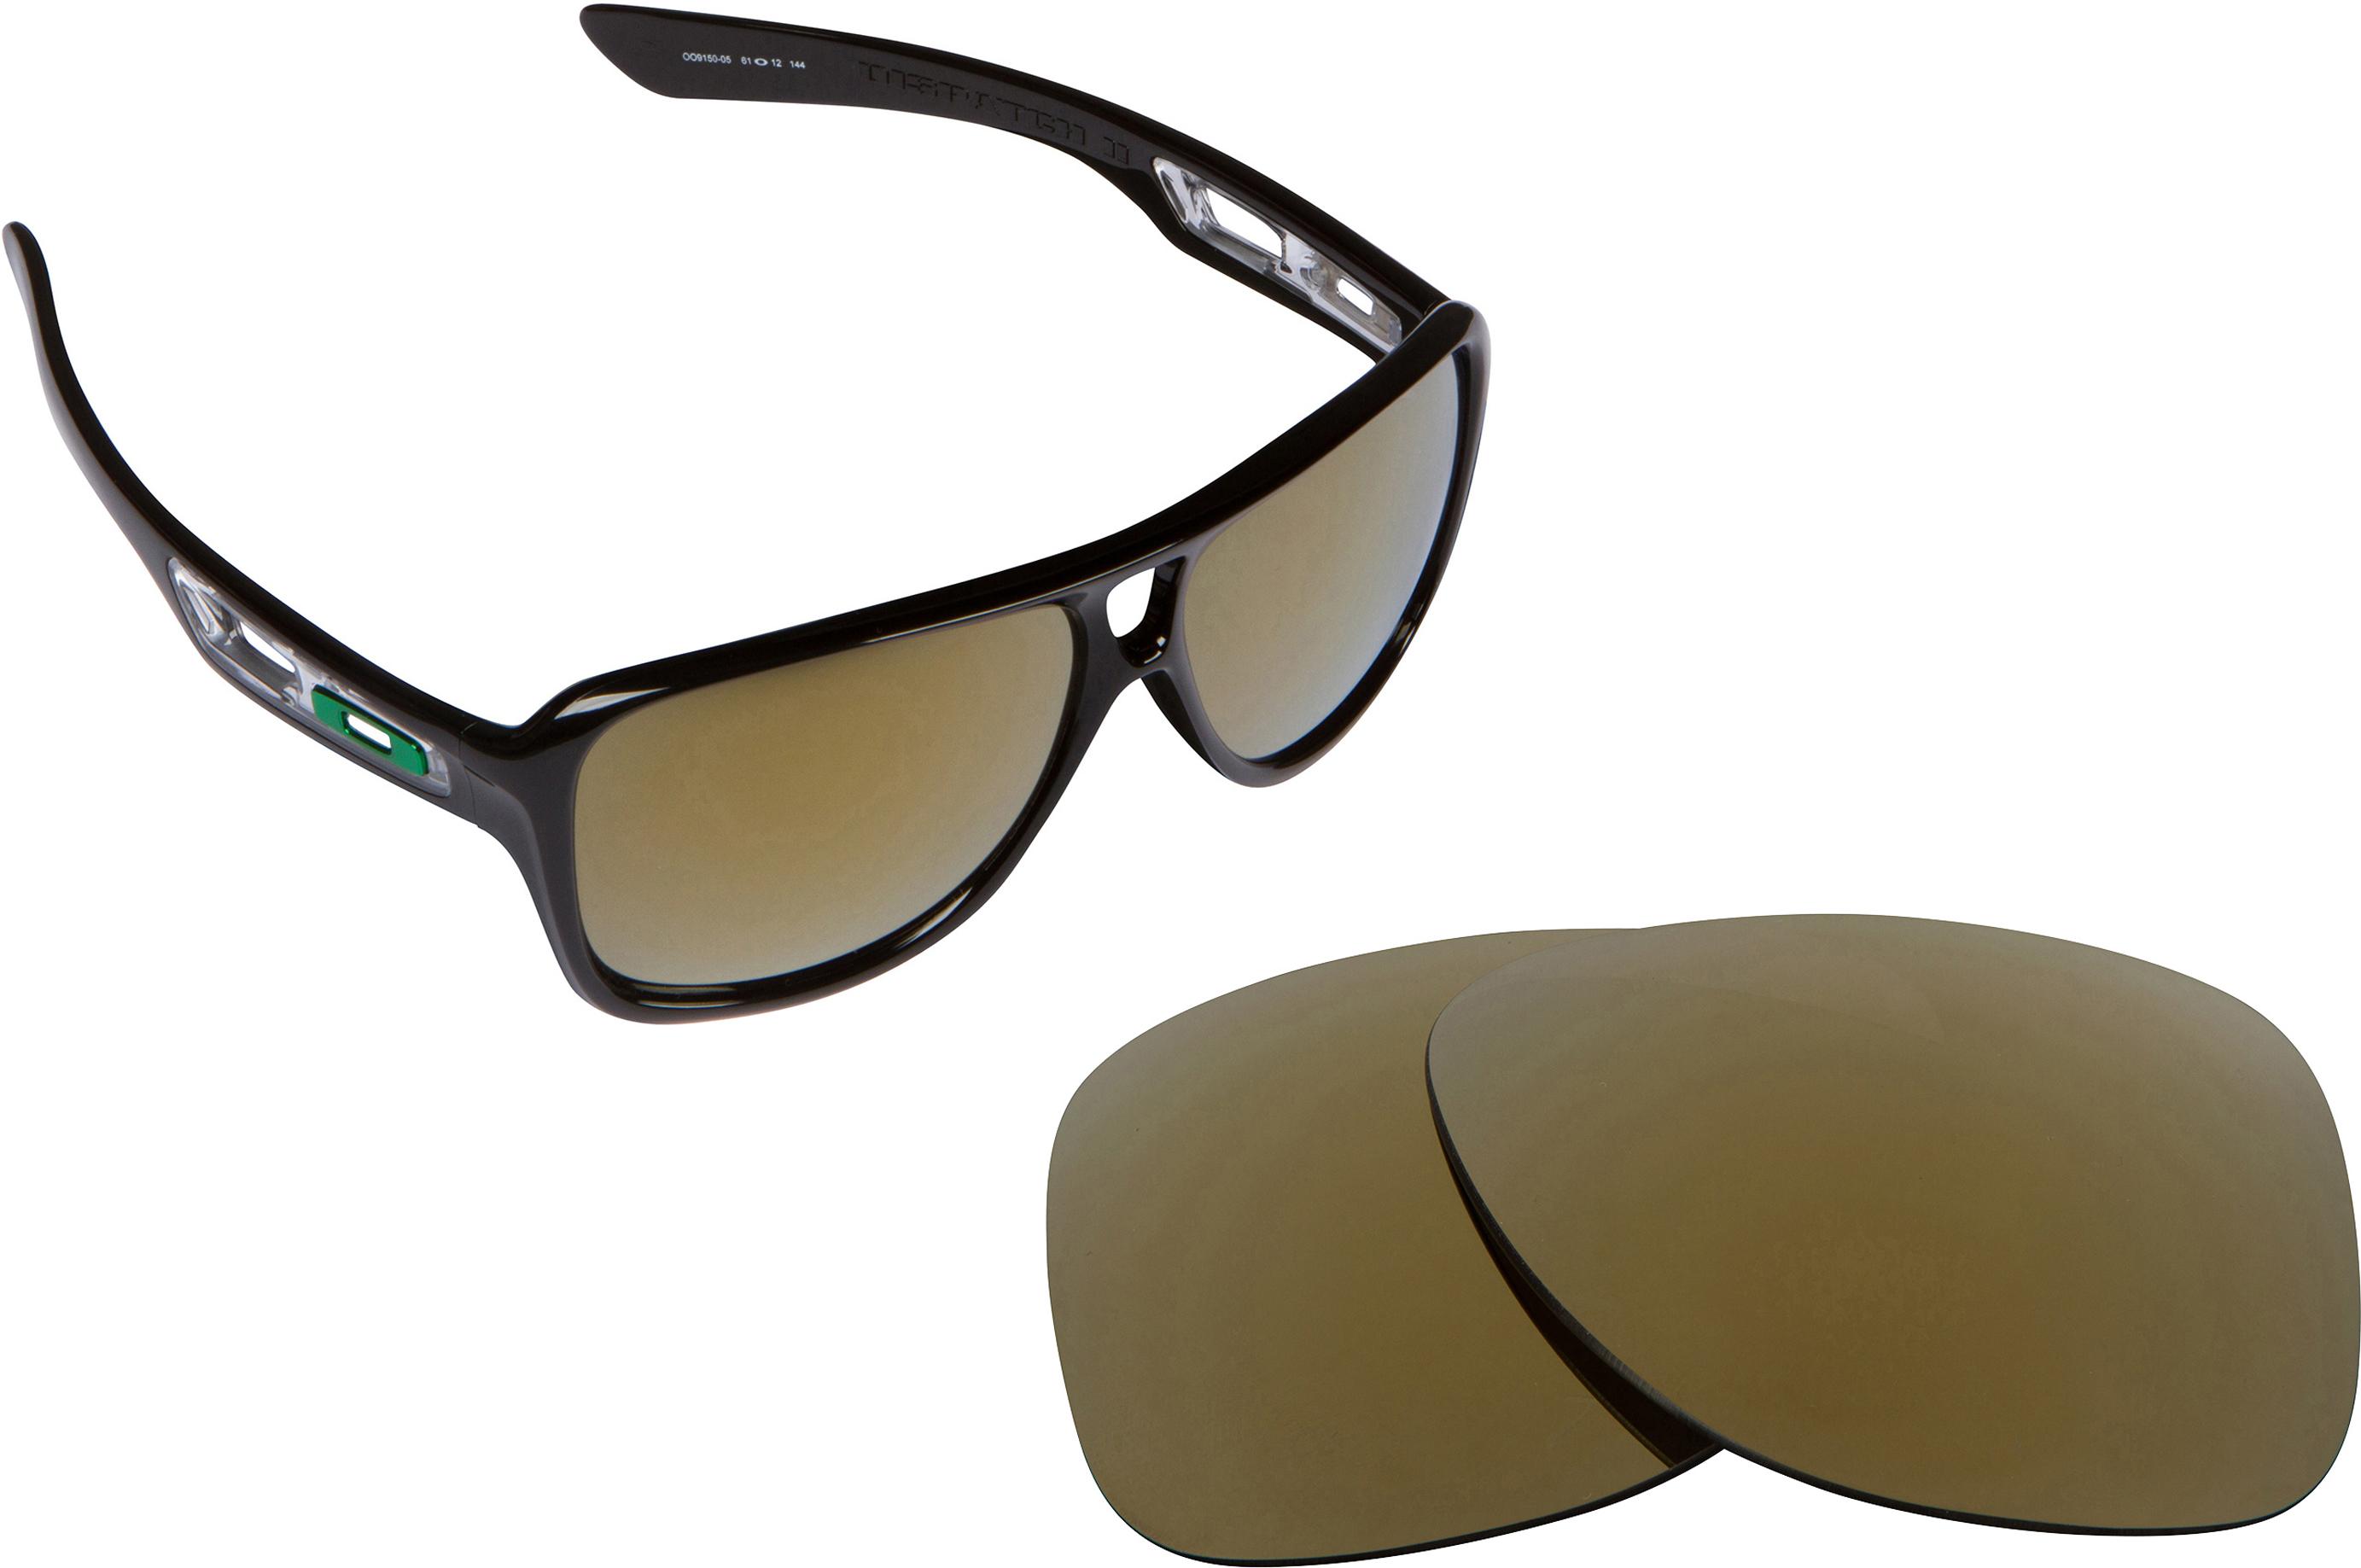 b1150ba6a28cc Oakley Dispatch Sunglasses Size   City of Kenmore, Washington